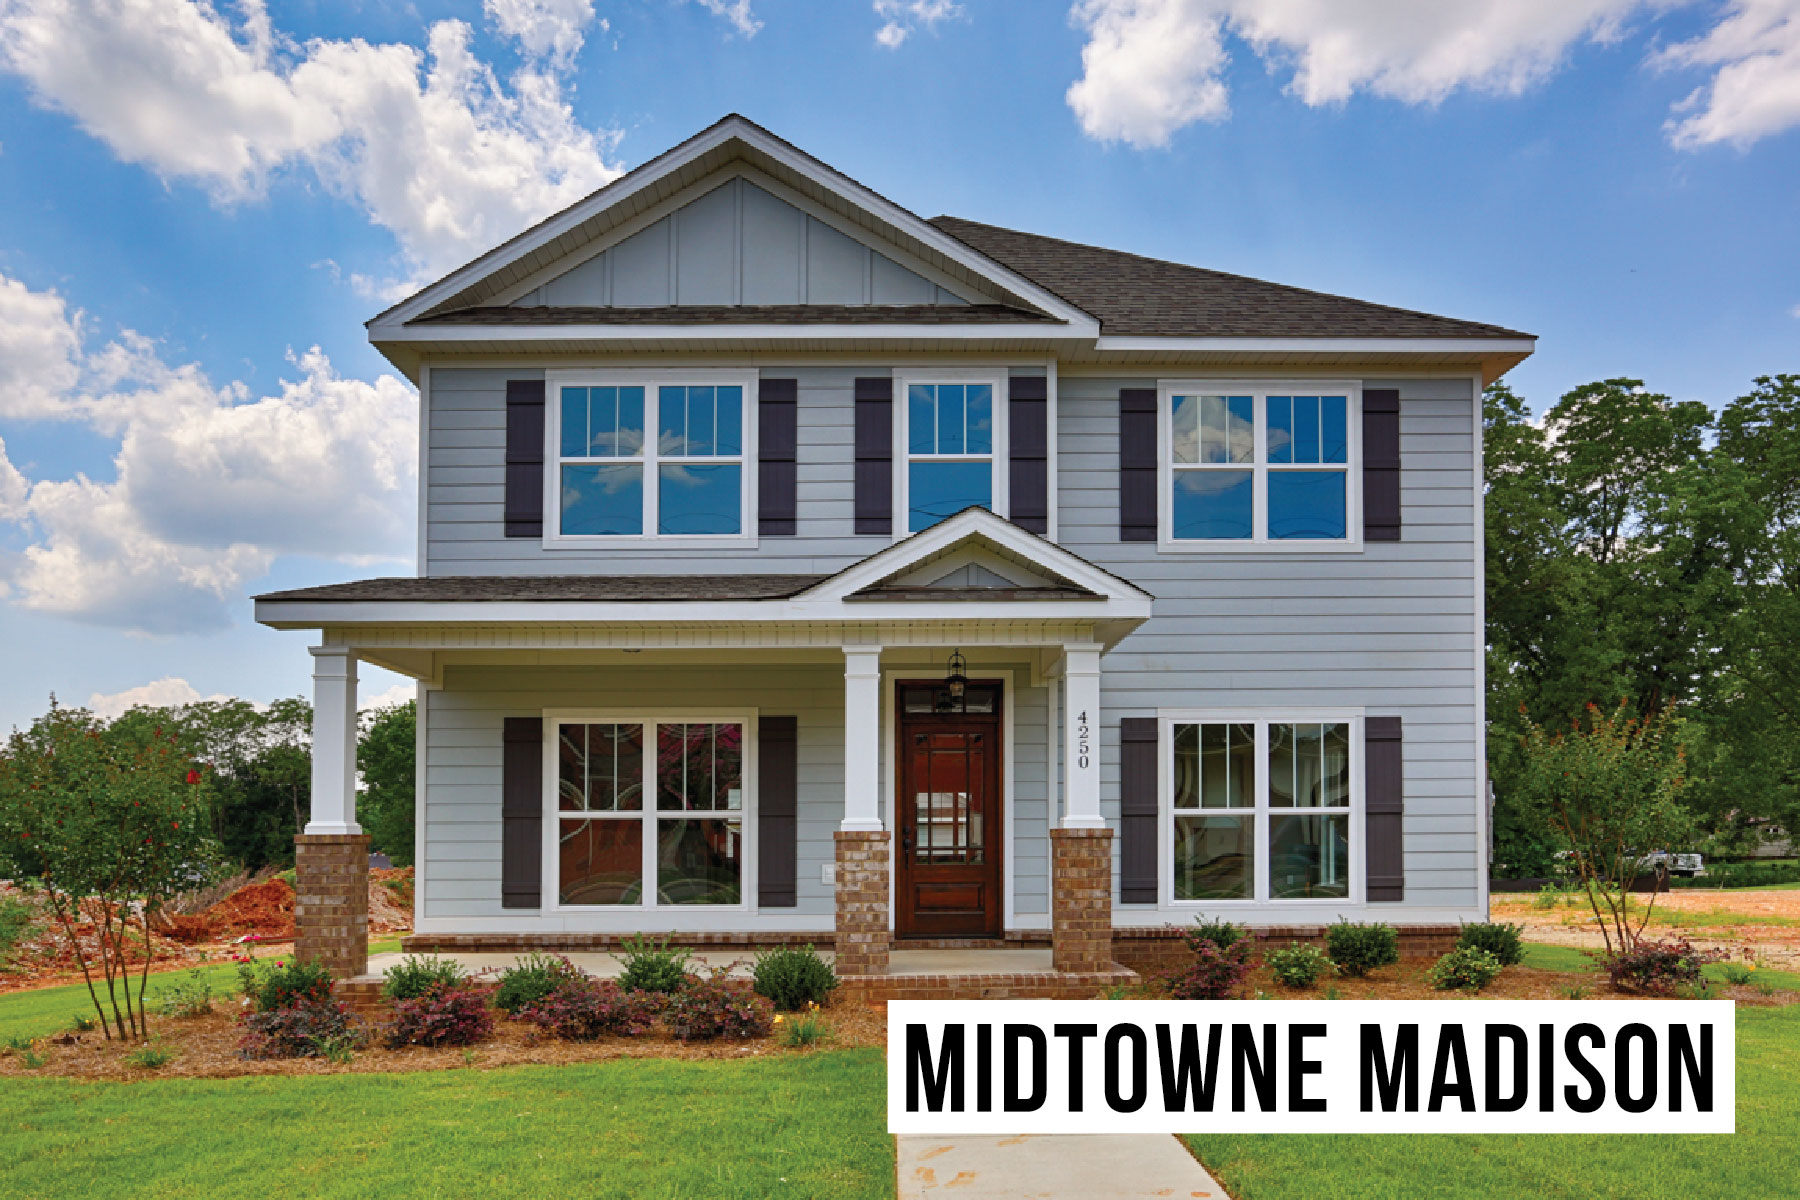 Midtowne Madison